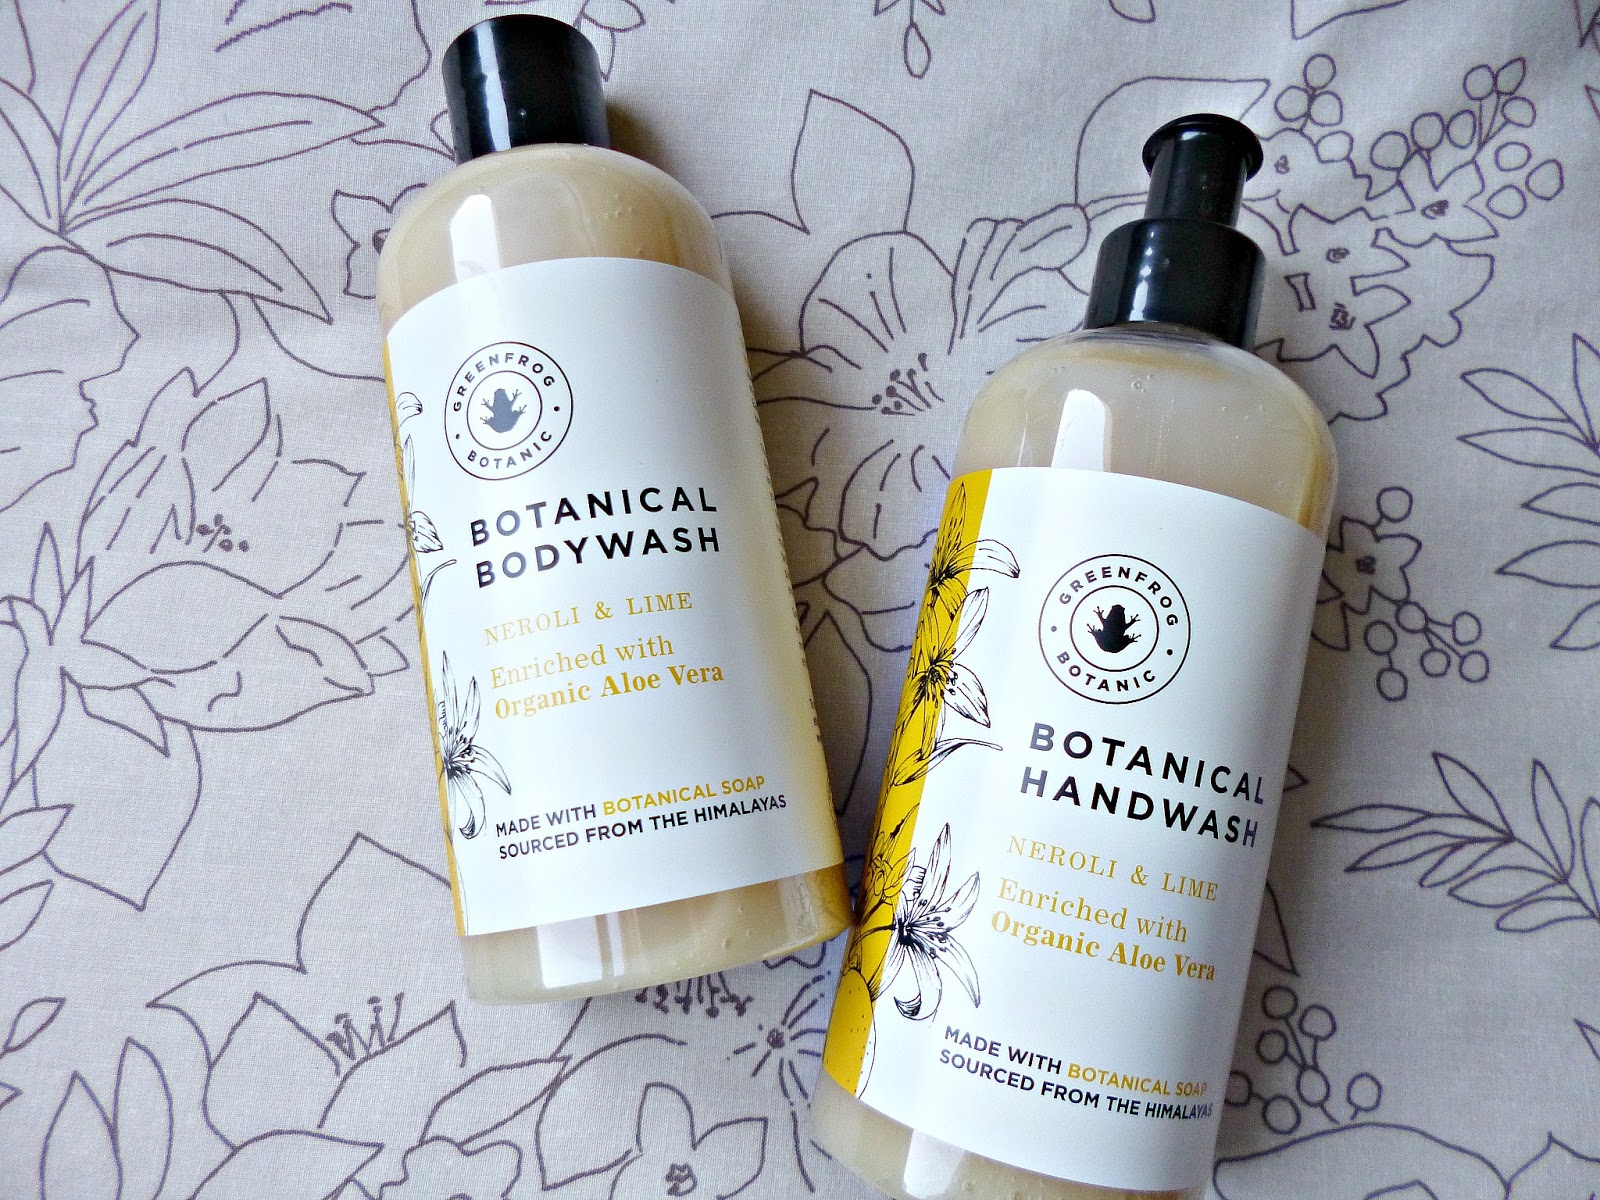 Greenfrog Botanical handwash and bodywash